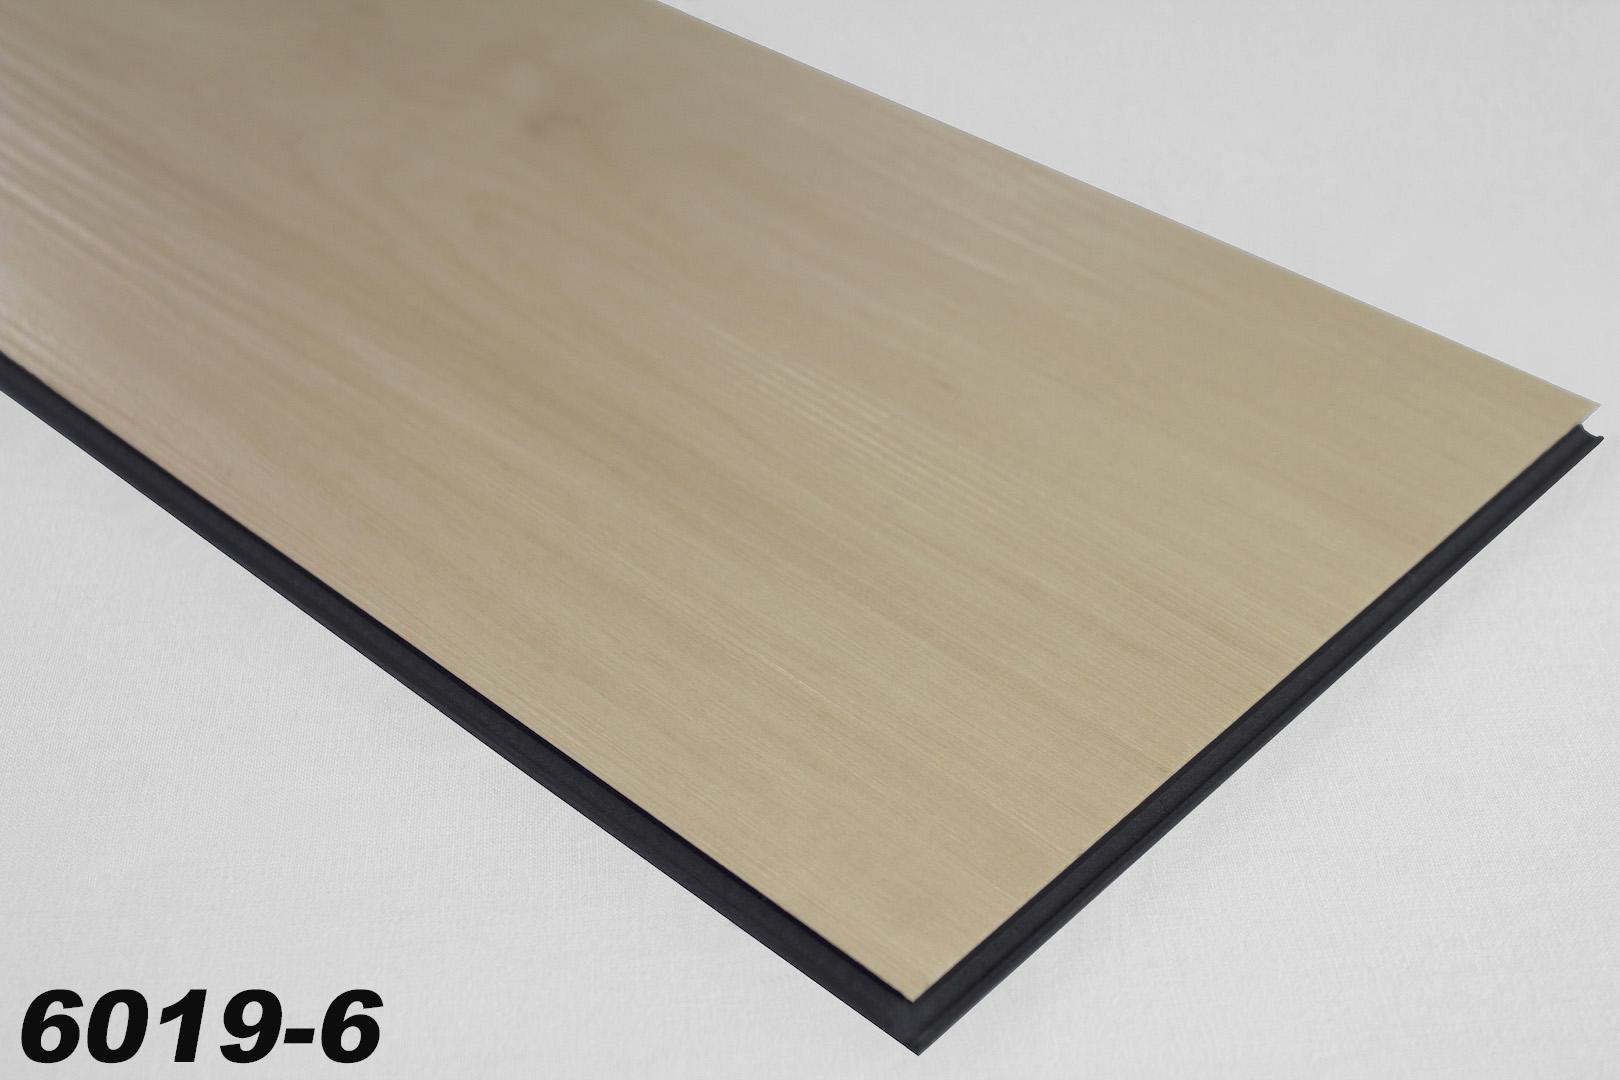 2,12 m² Vinylboden in 4,2mm Uniclic PVC-Bodenbelag Nutzschicht 0,3mm, 6019-6